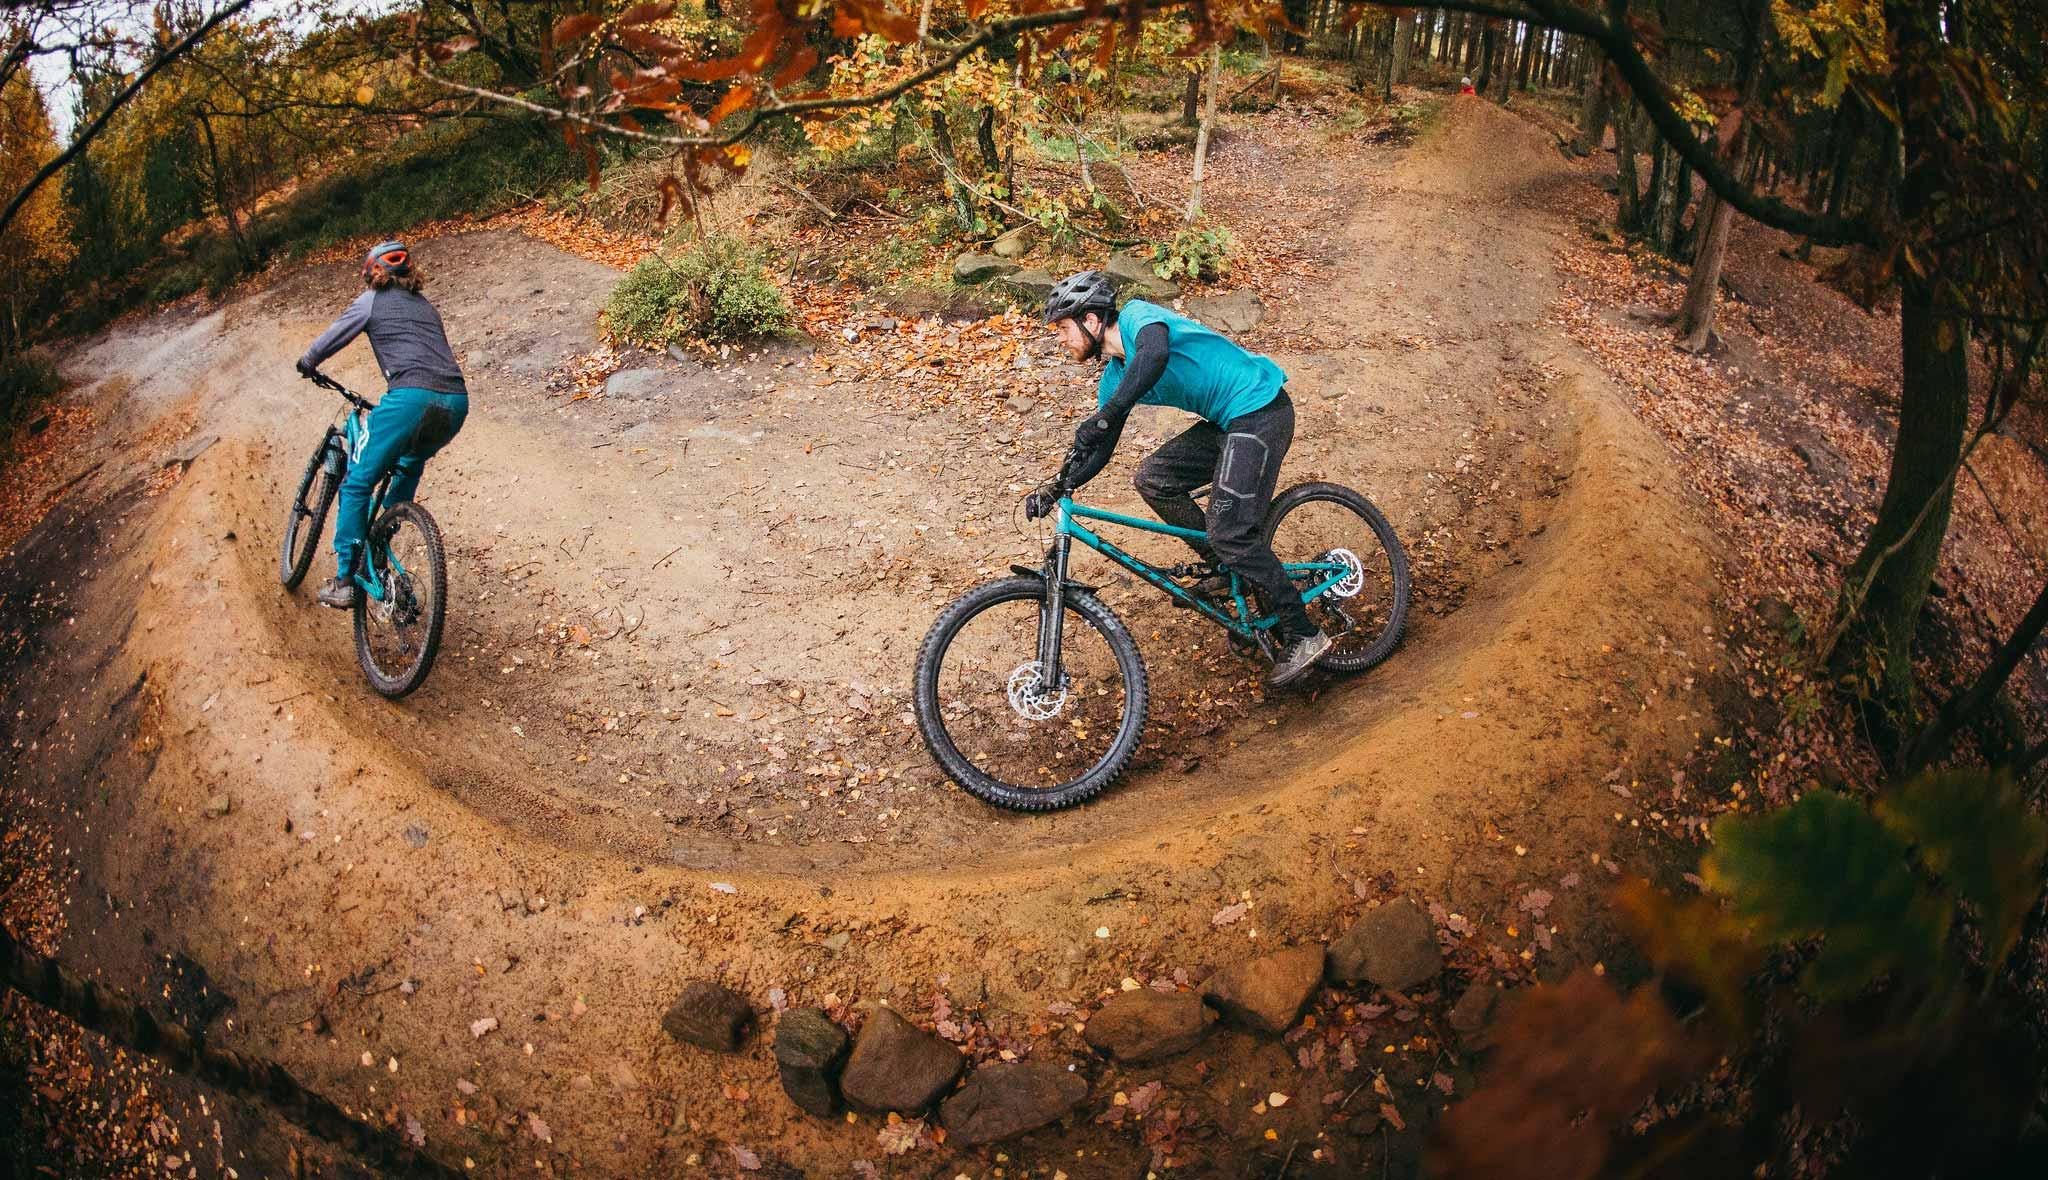 Cotic Jeht, endruo mountain bike, 29er mountain bike, reynolds 853, steel full suspension, steel is real